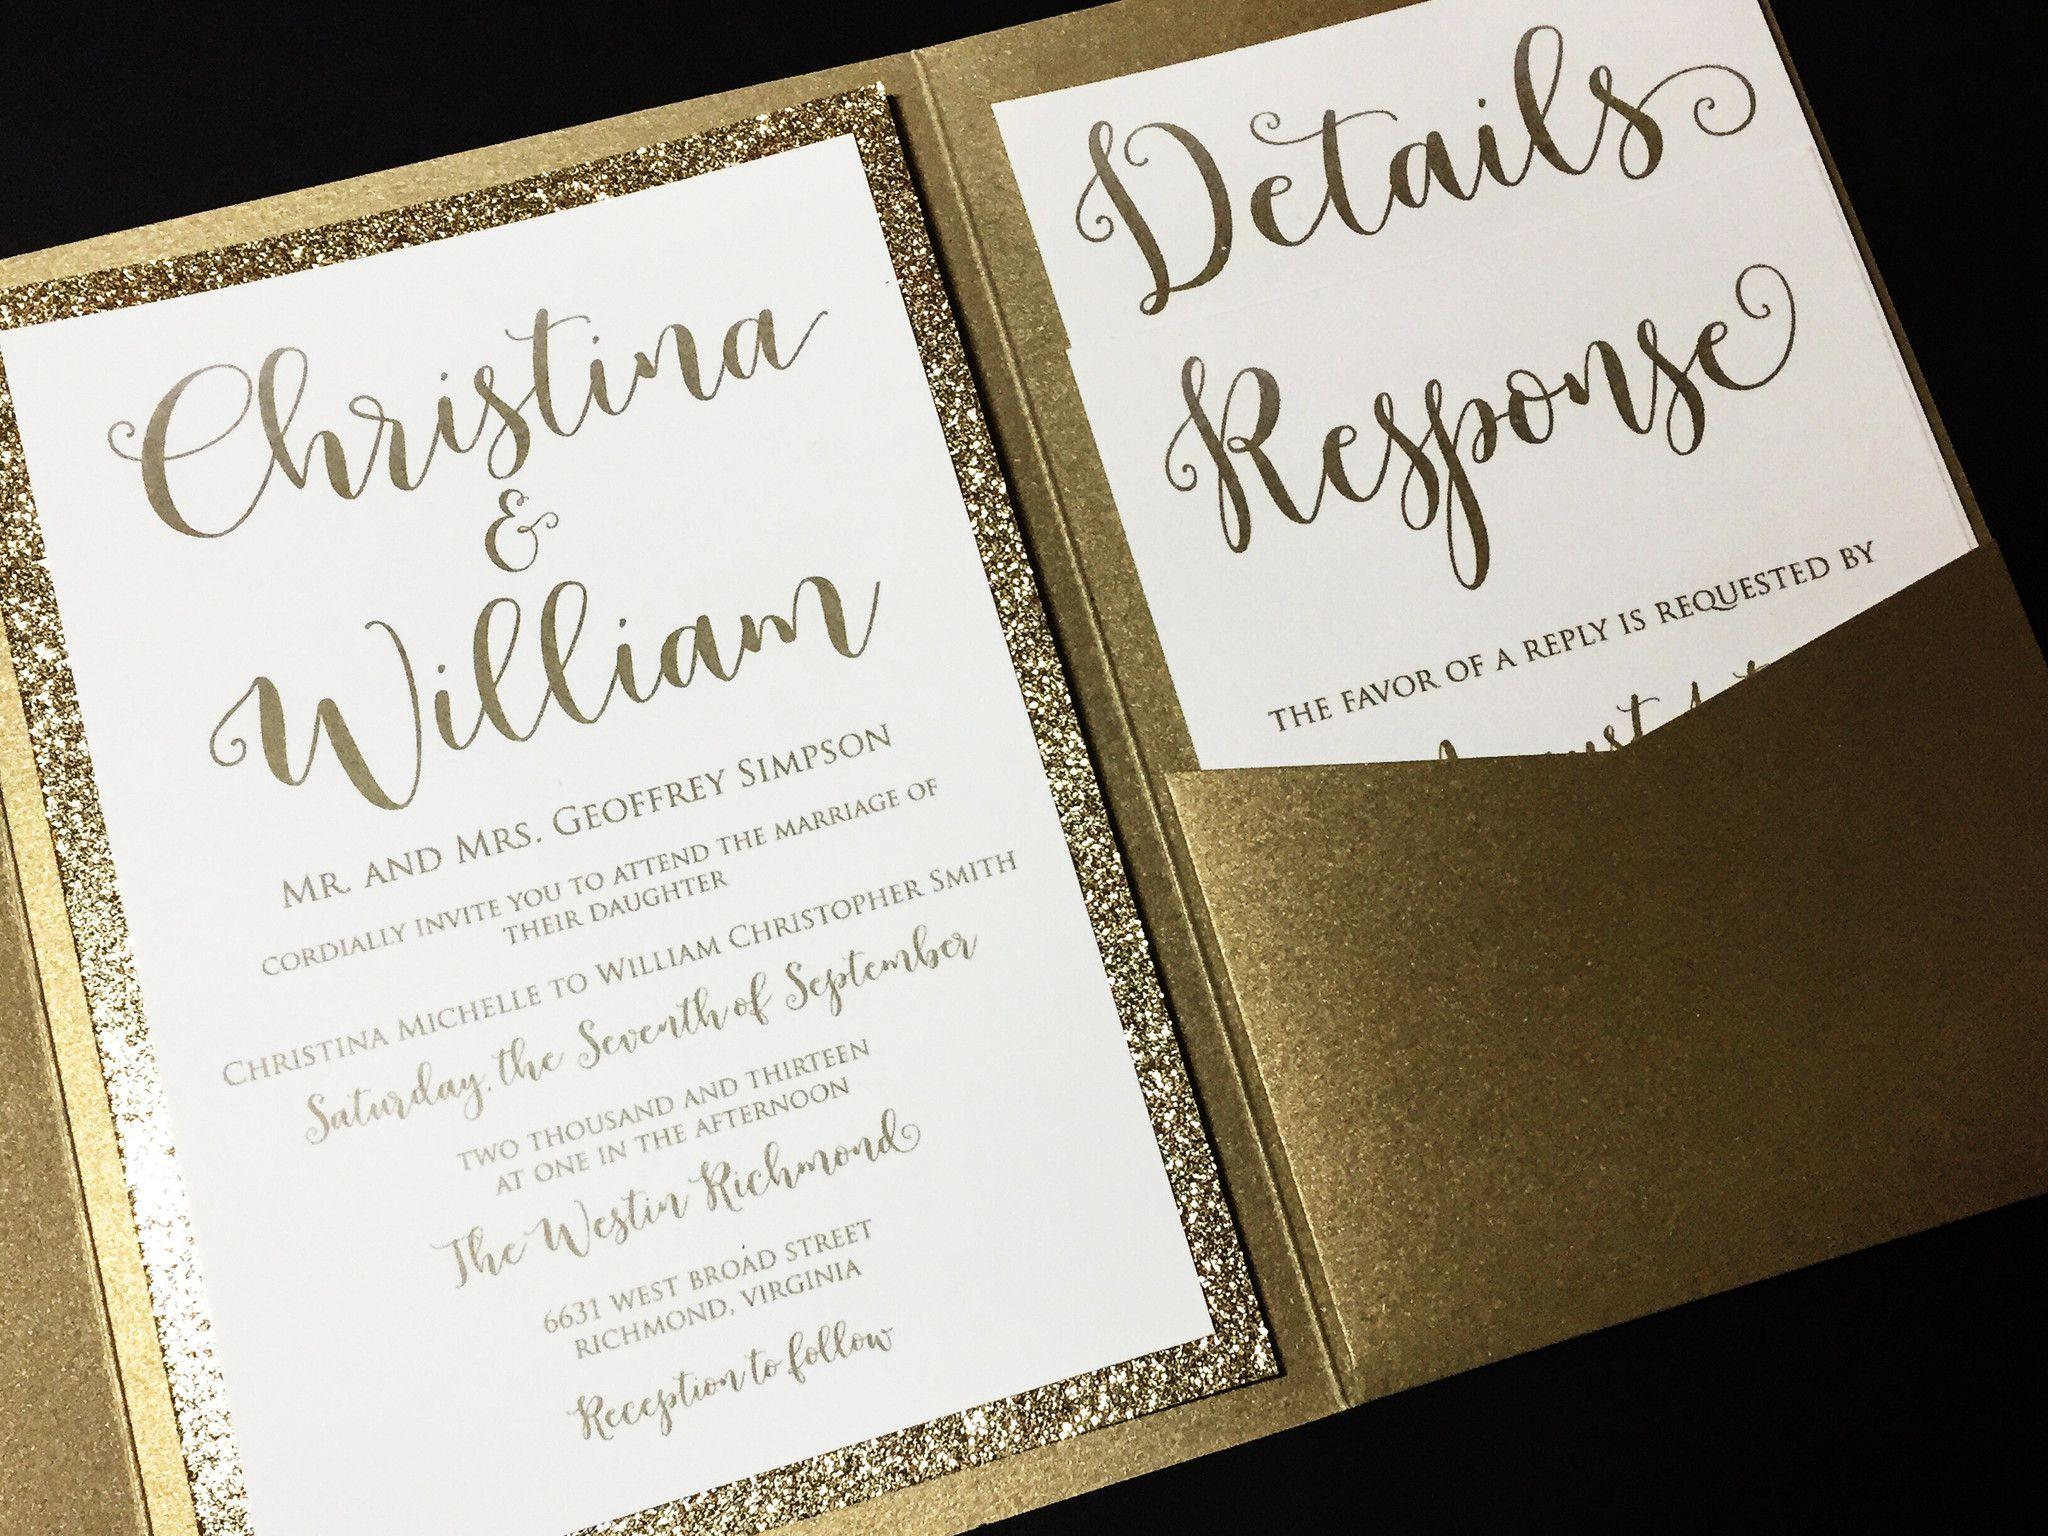 formal wedding invitations Glitter Wedding Invitation Luxury Pocketfold Wedding Invitation Elegant Wedding Invitation Formal Wedding Invitation Gold and Gold Glitter Wedding